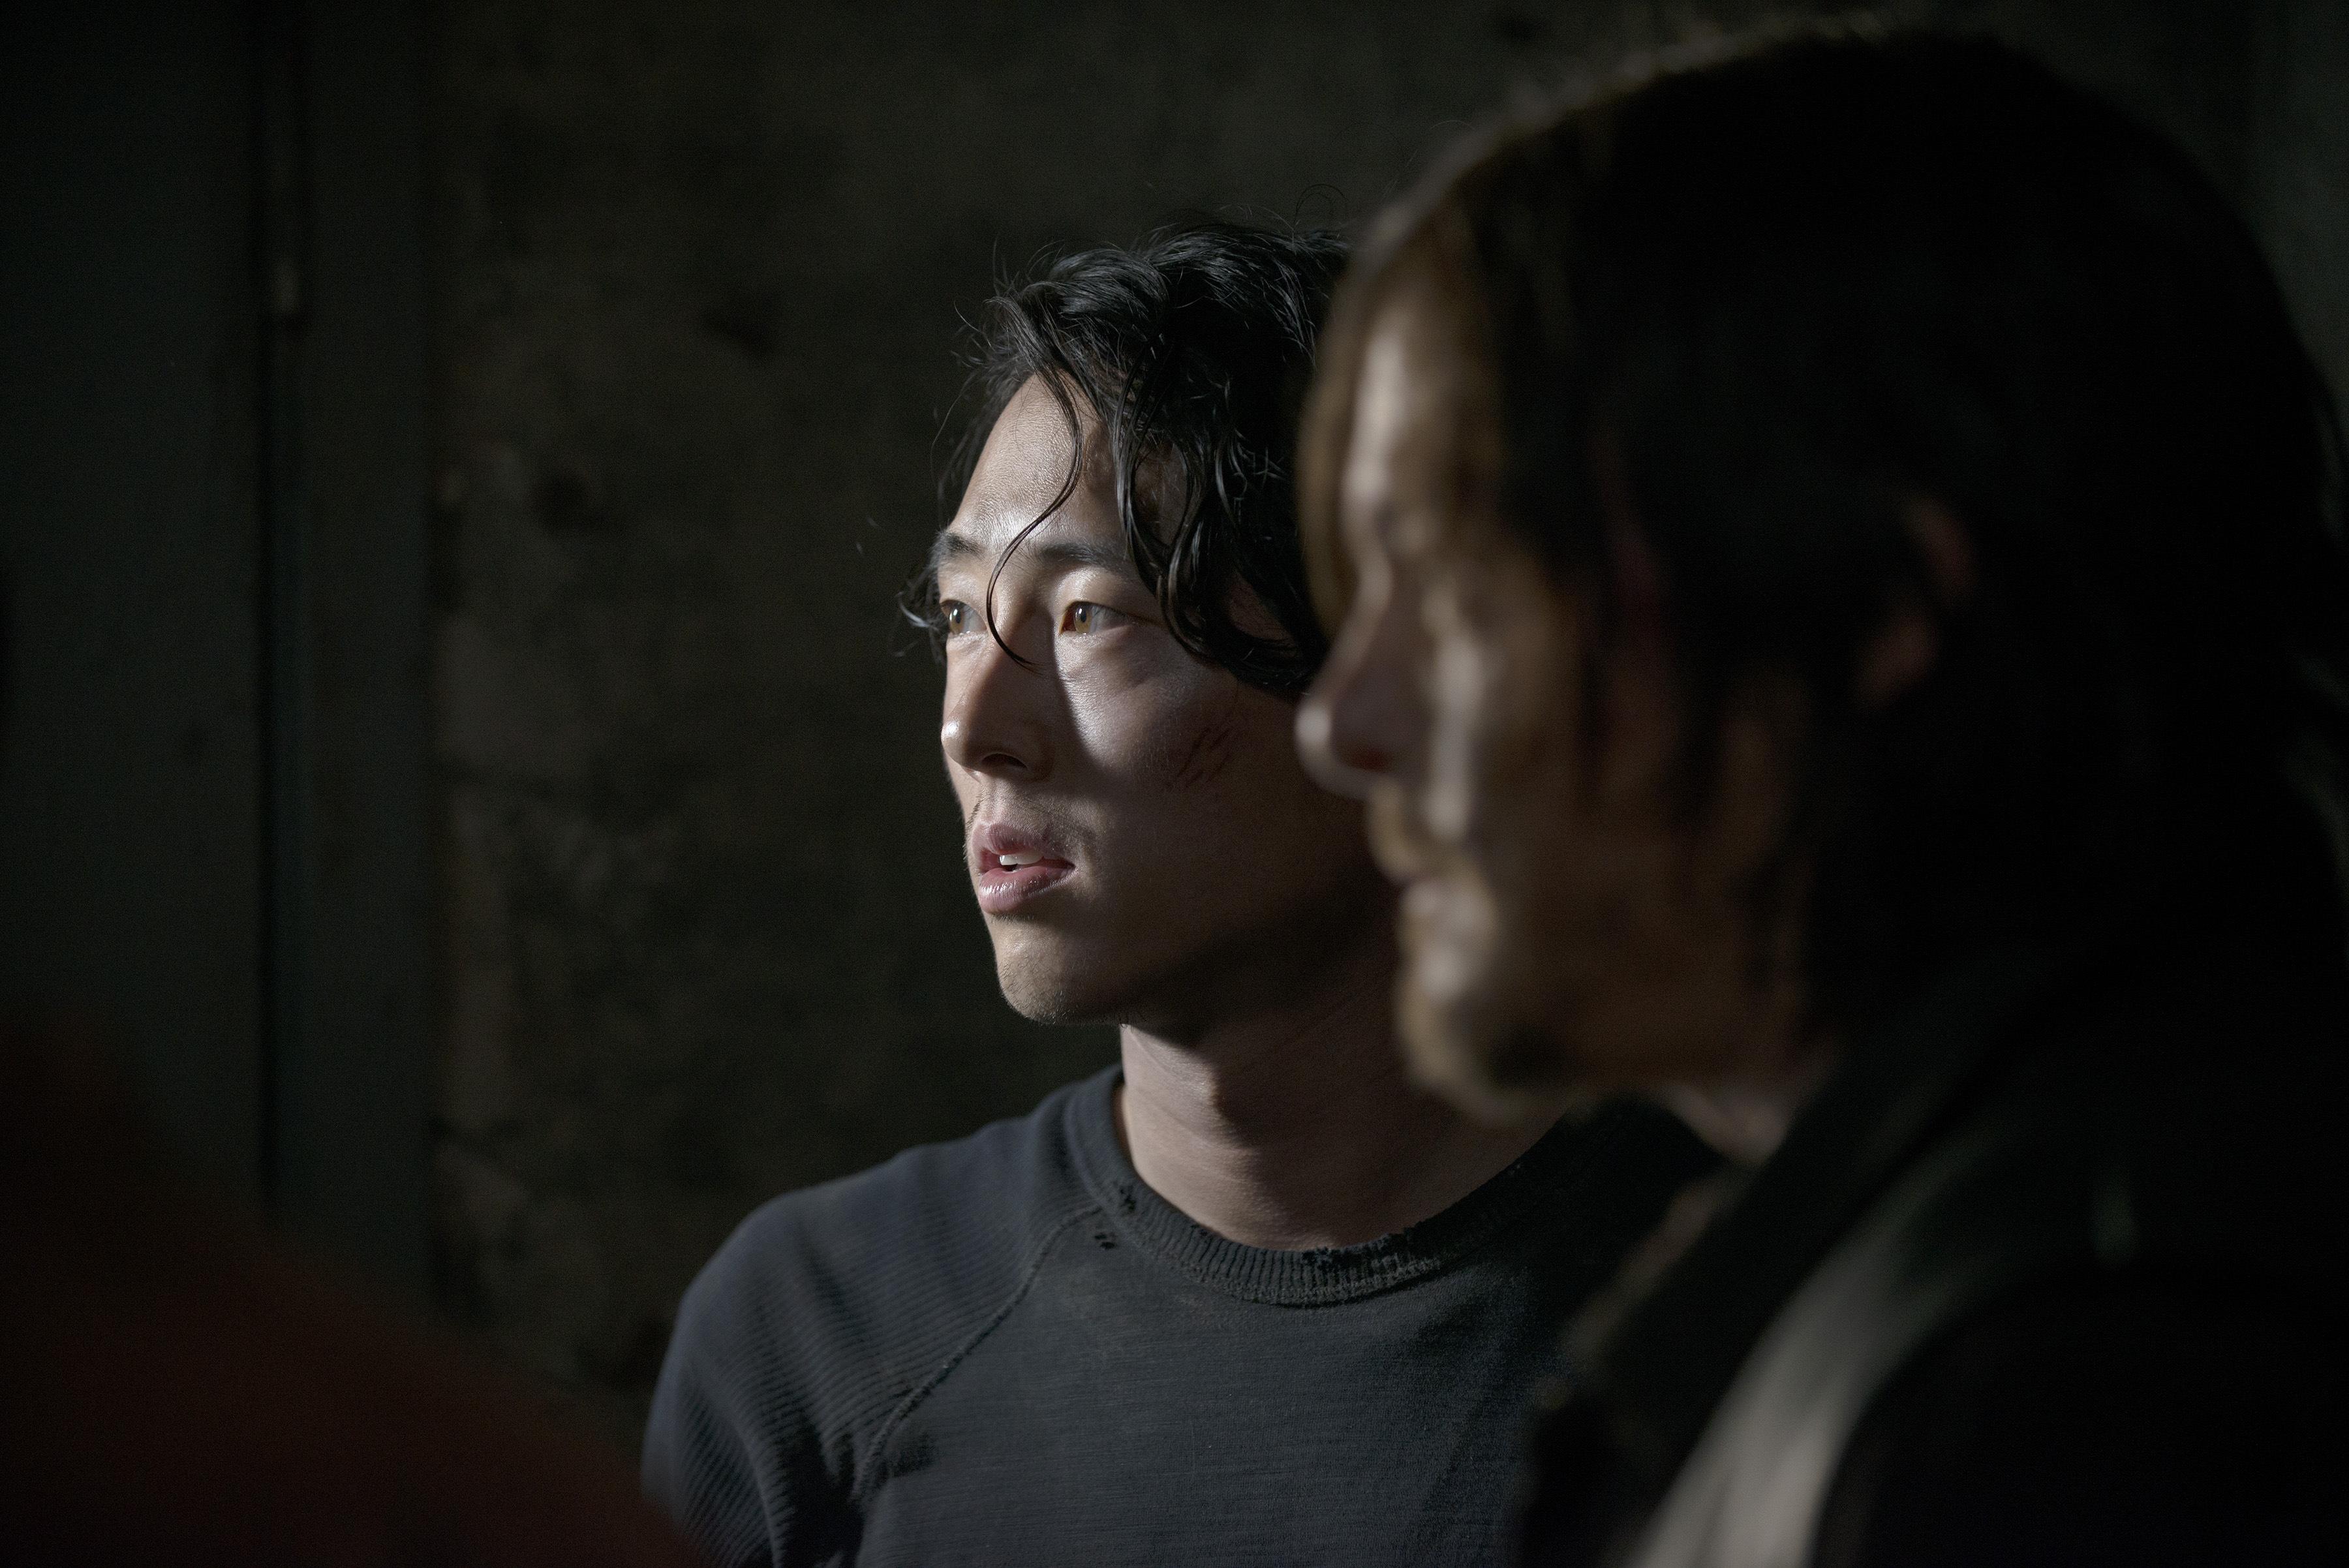 Glenn-Daryl-The-Walking-Dead-5-Temporada-S05E01-No-Sanctuary-HQ-001